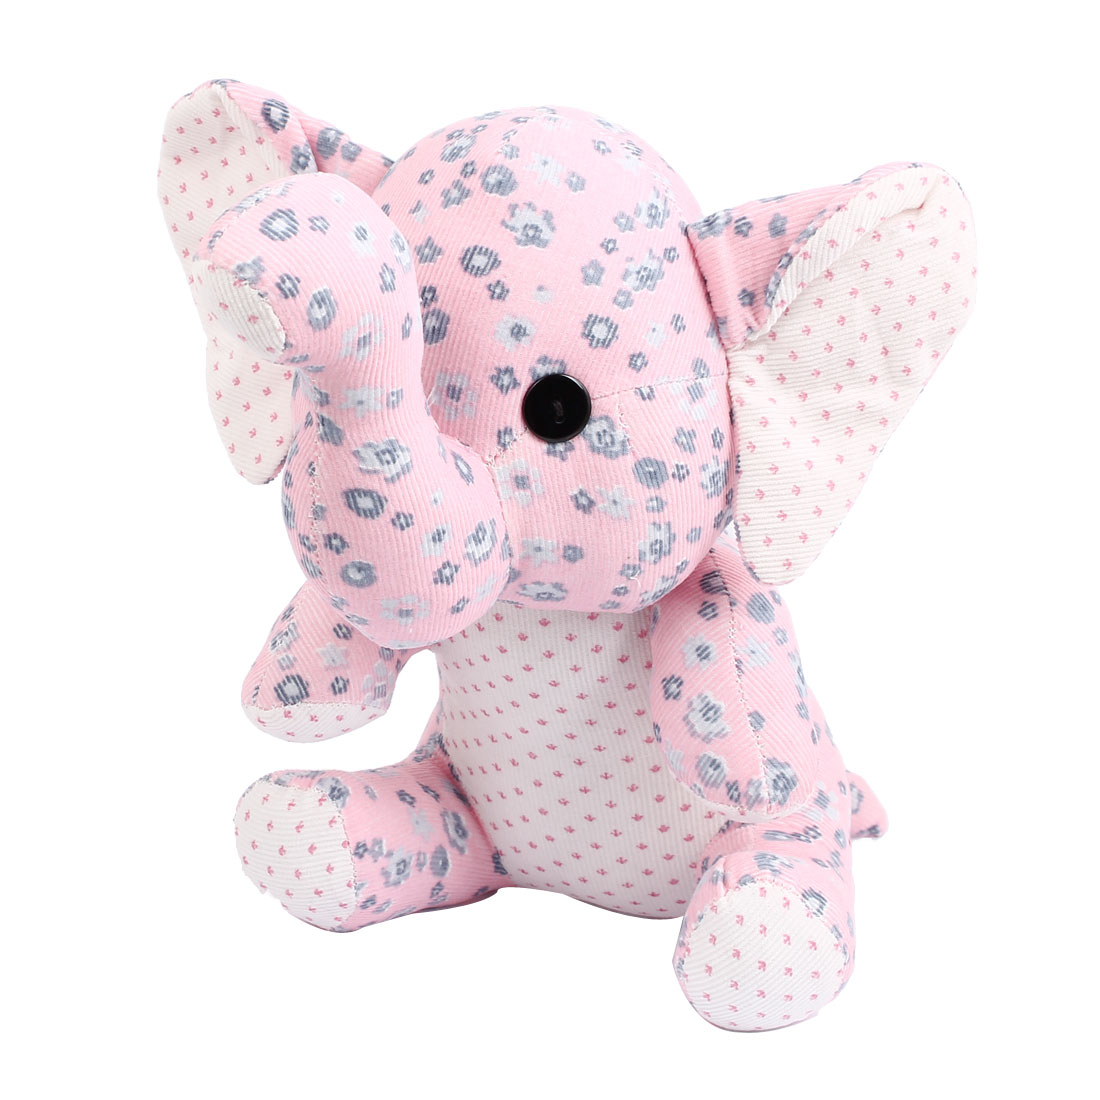 Children Kids Flower Pattern Birthday Party Gift Animal Toy Sitting Elephant Doll Pink